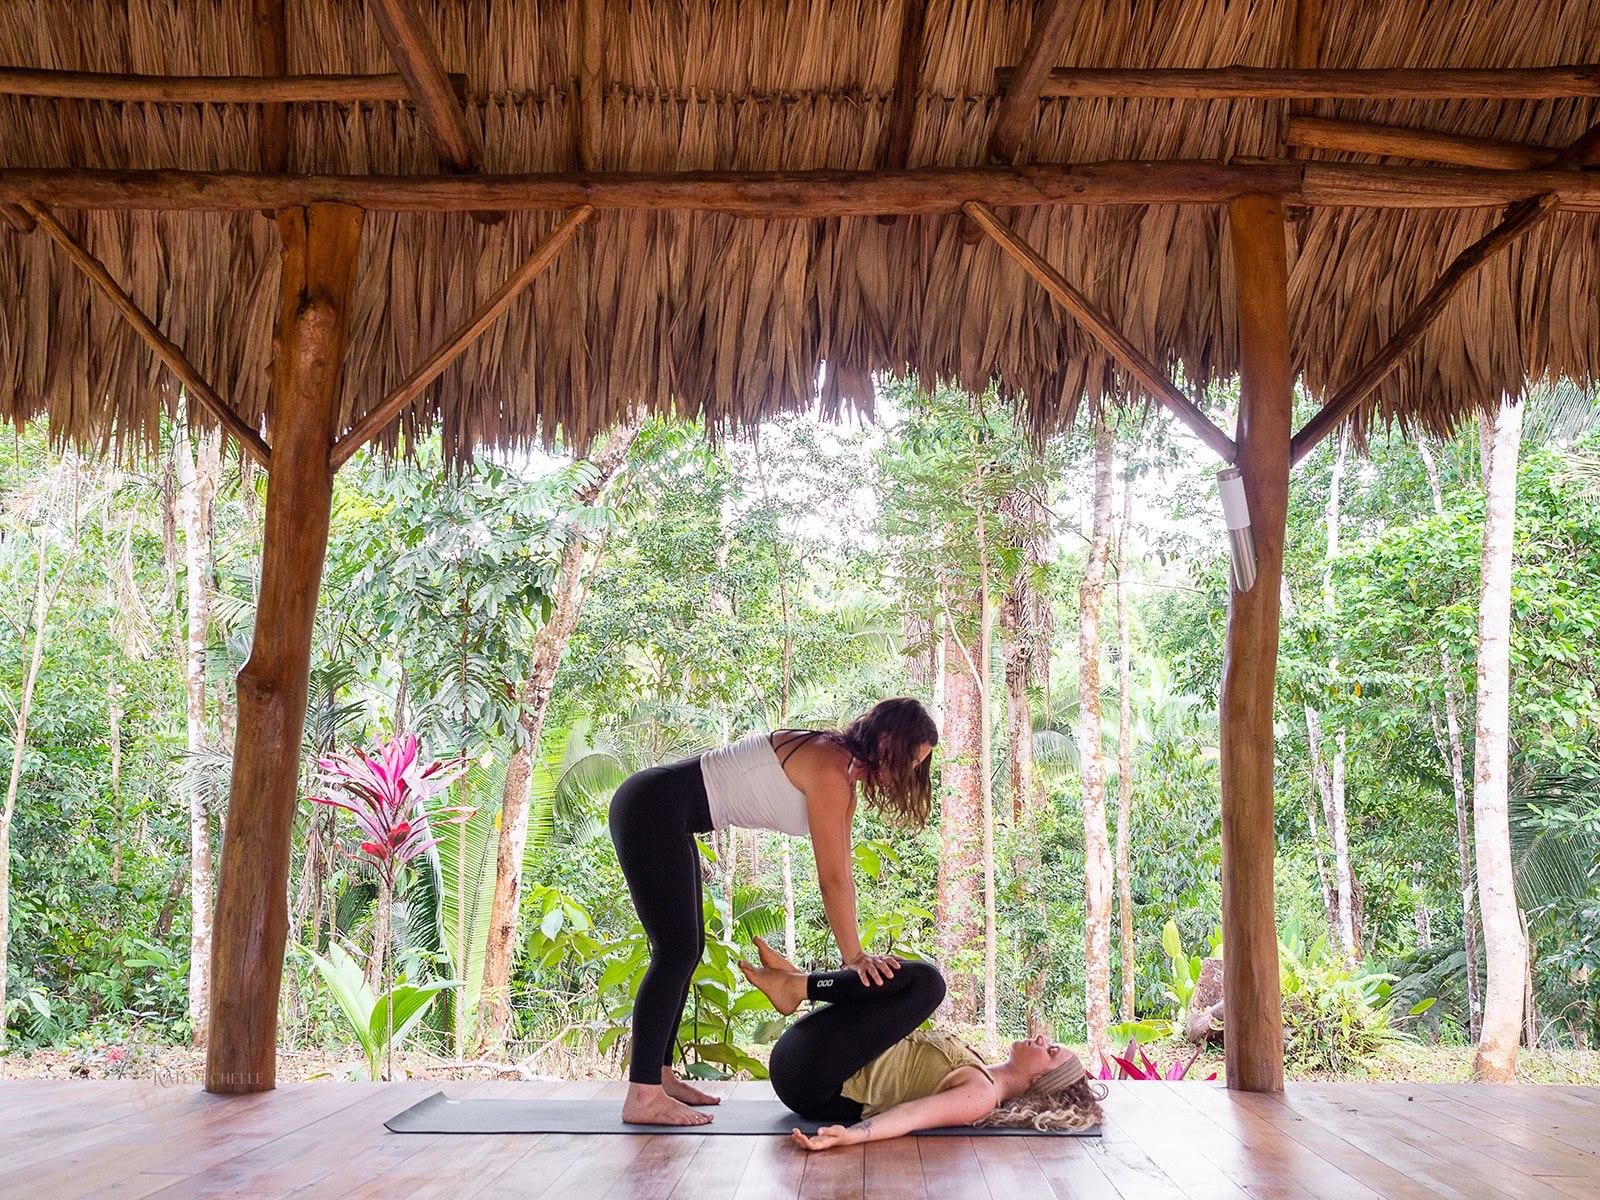 kylie-roswell-yoga-teacher-training-durga-excursions-2.jpg